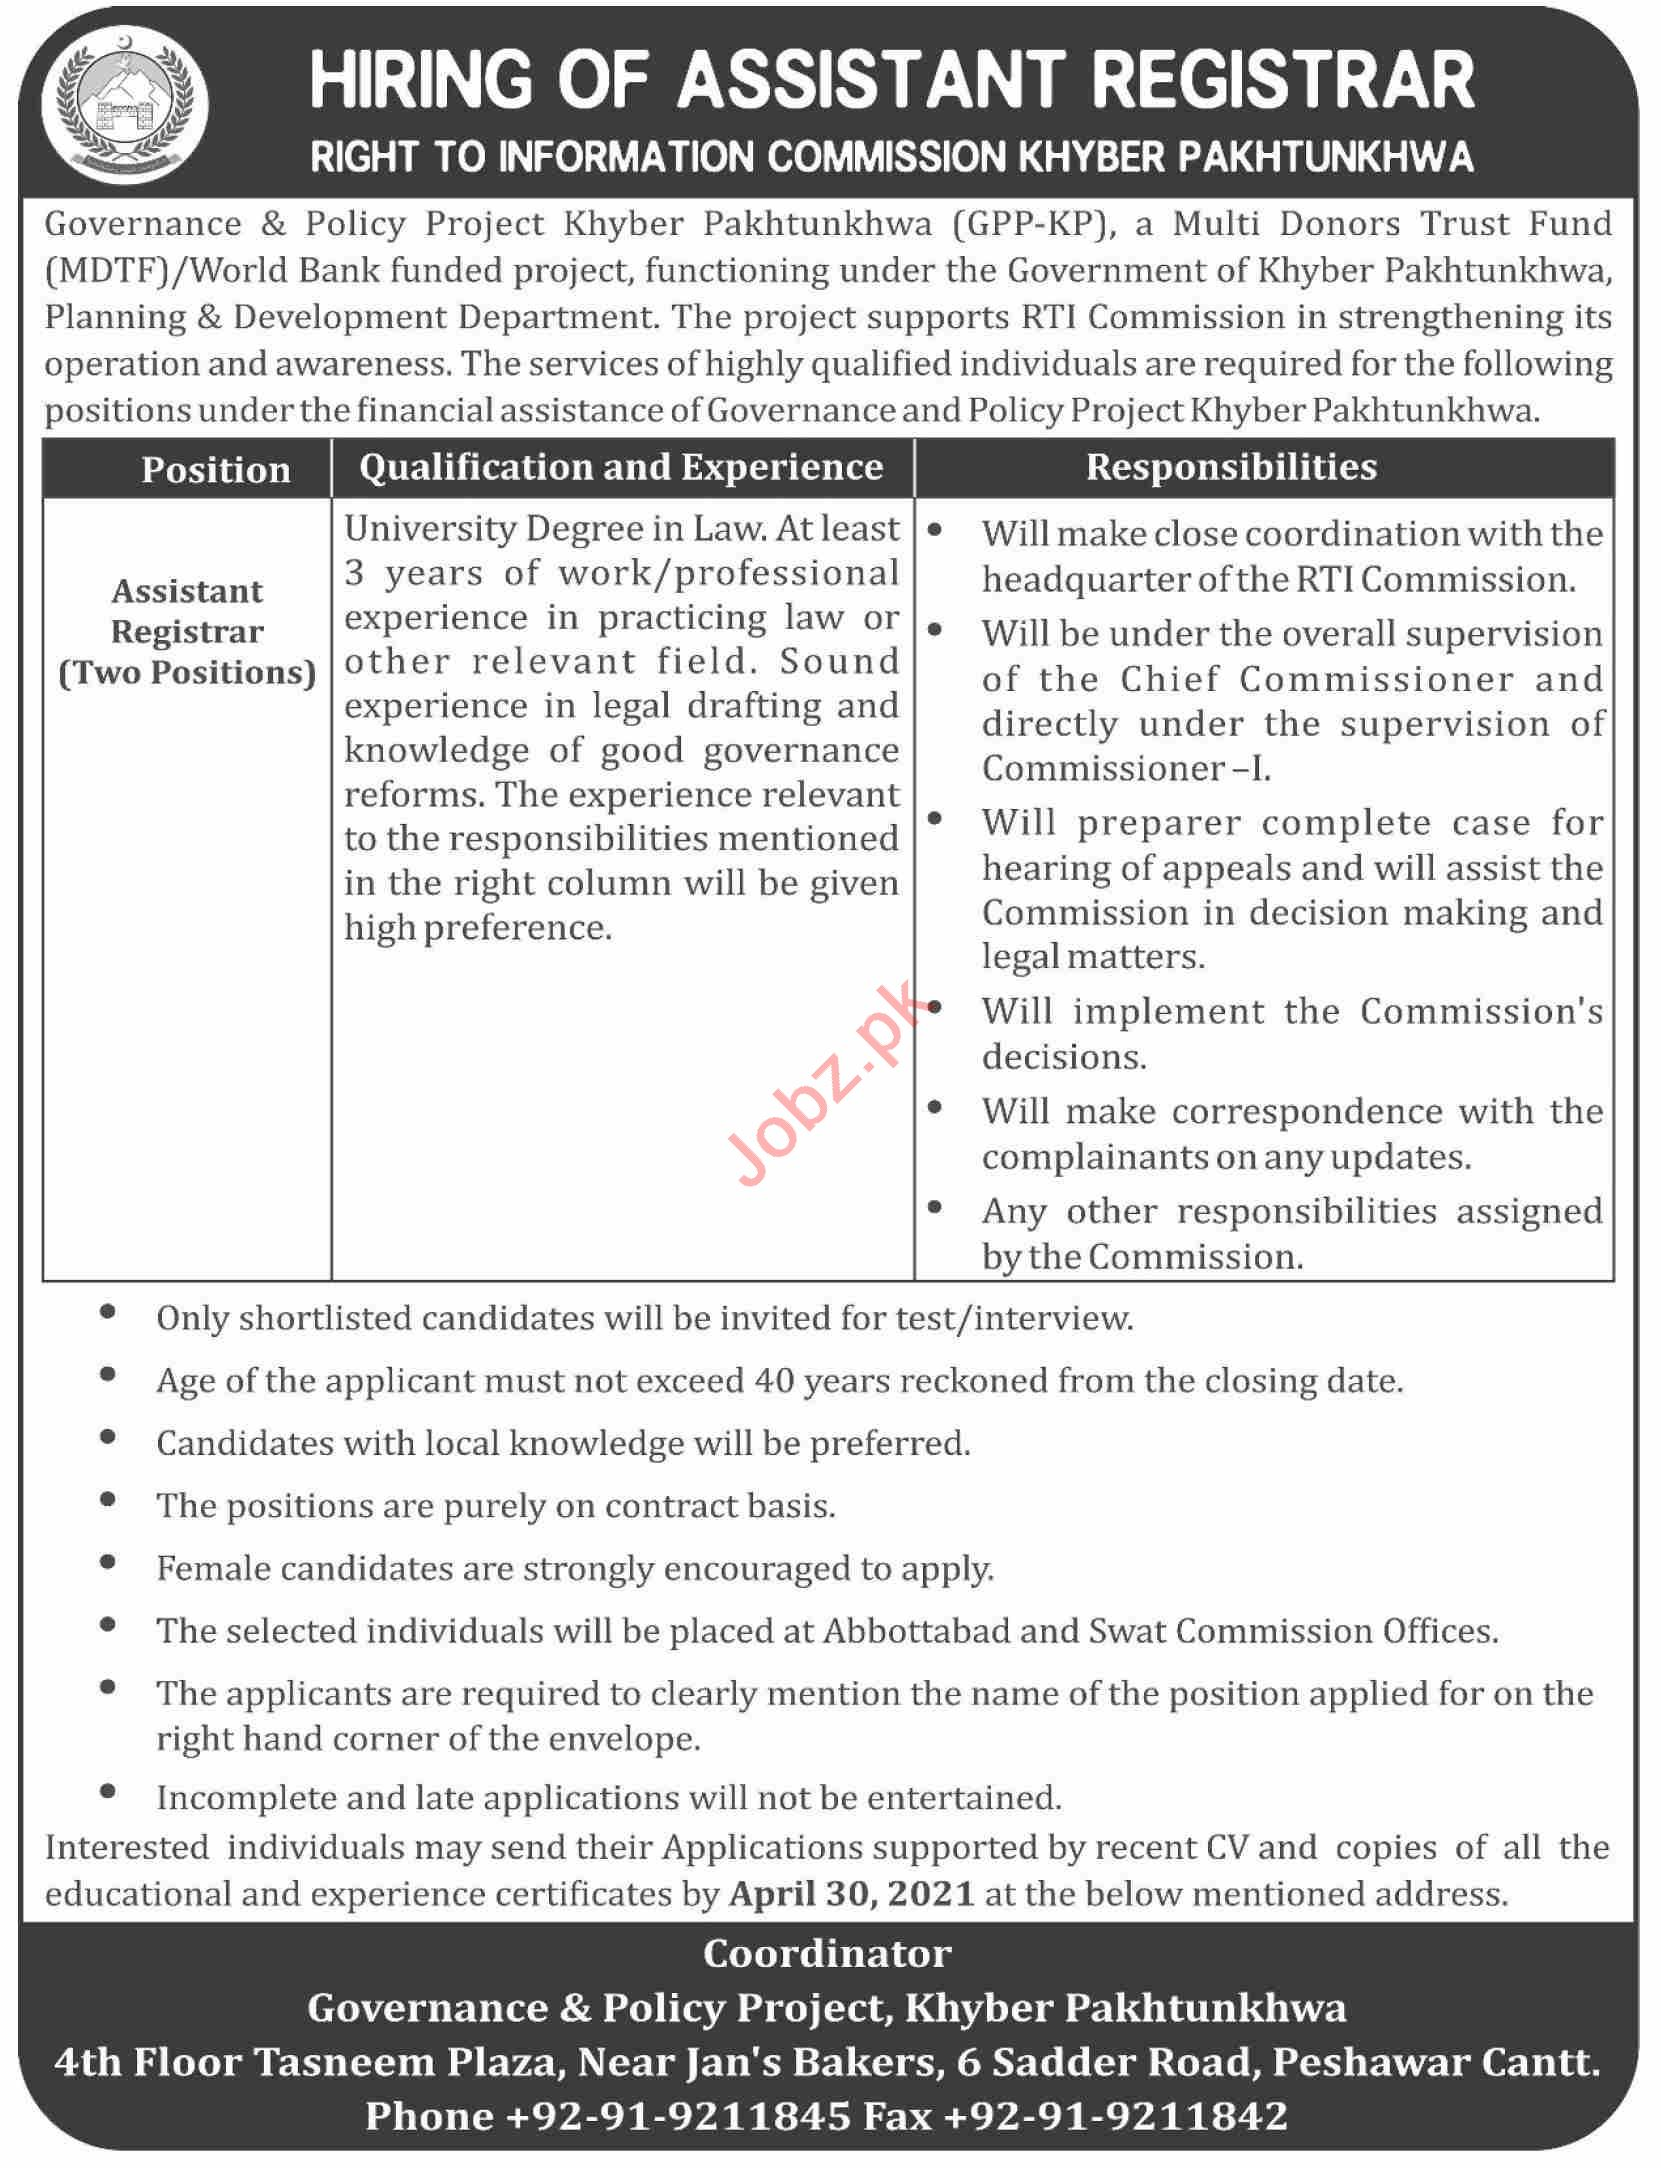 Khyber Pakhtunkhwa Information Commission KPIC Jobs 2021